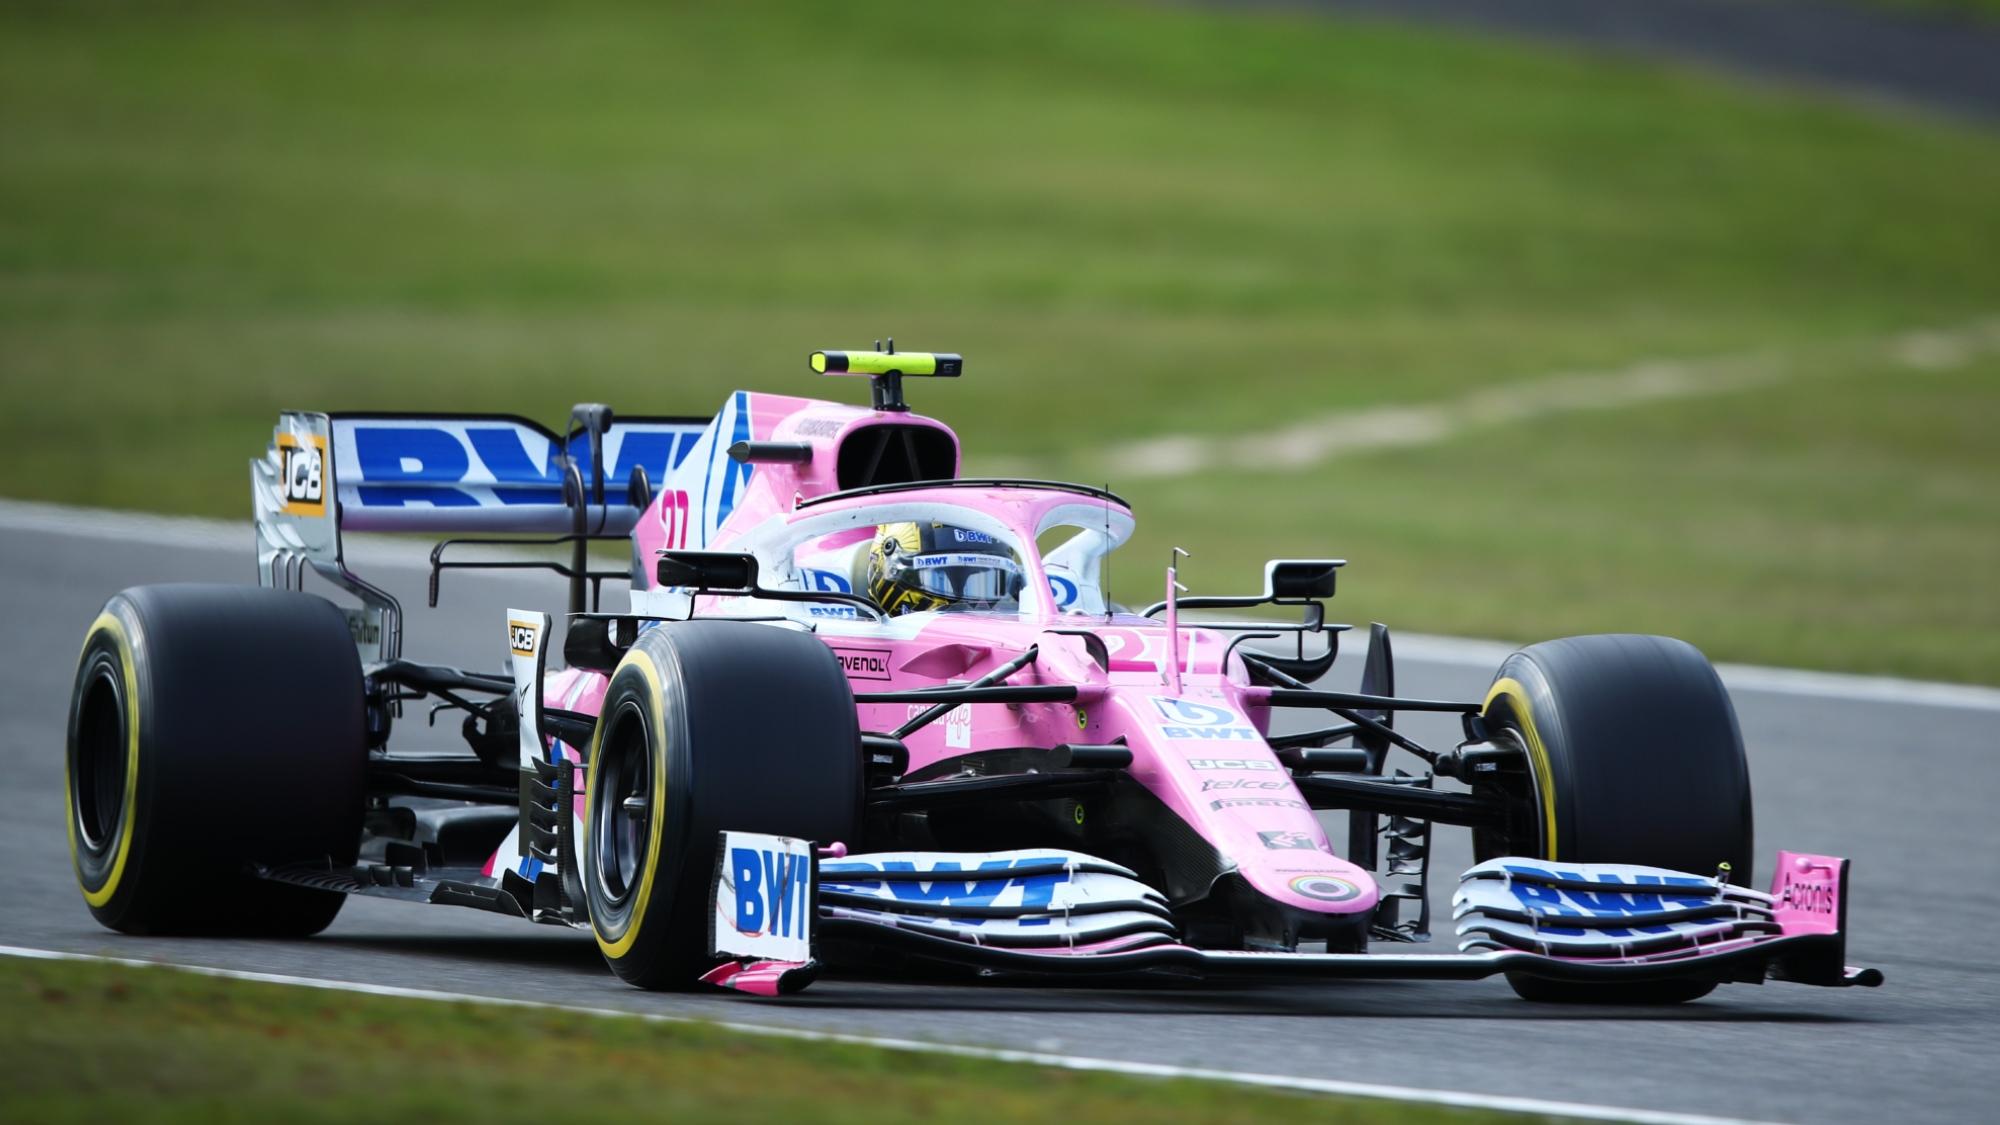 Nico Hulkenberg, 2020 Eifel GP